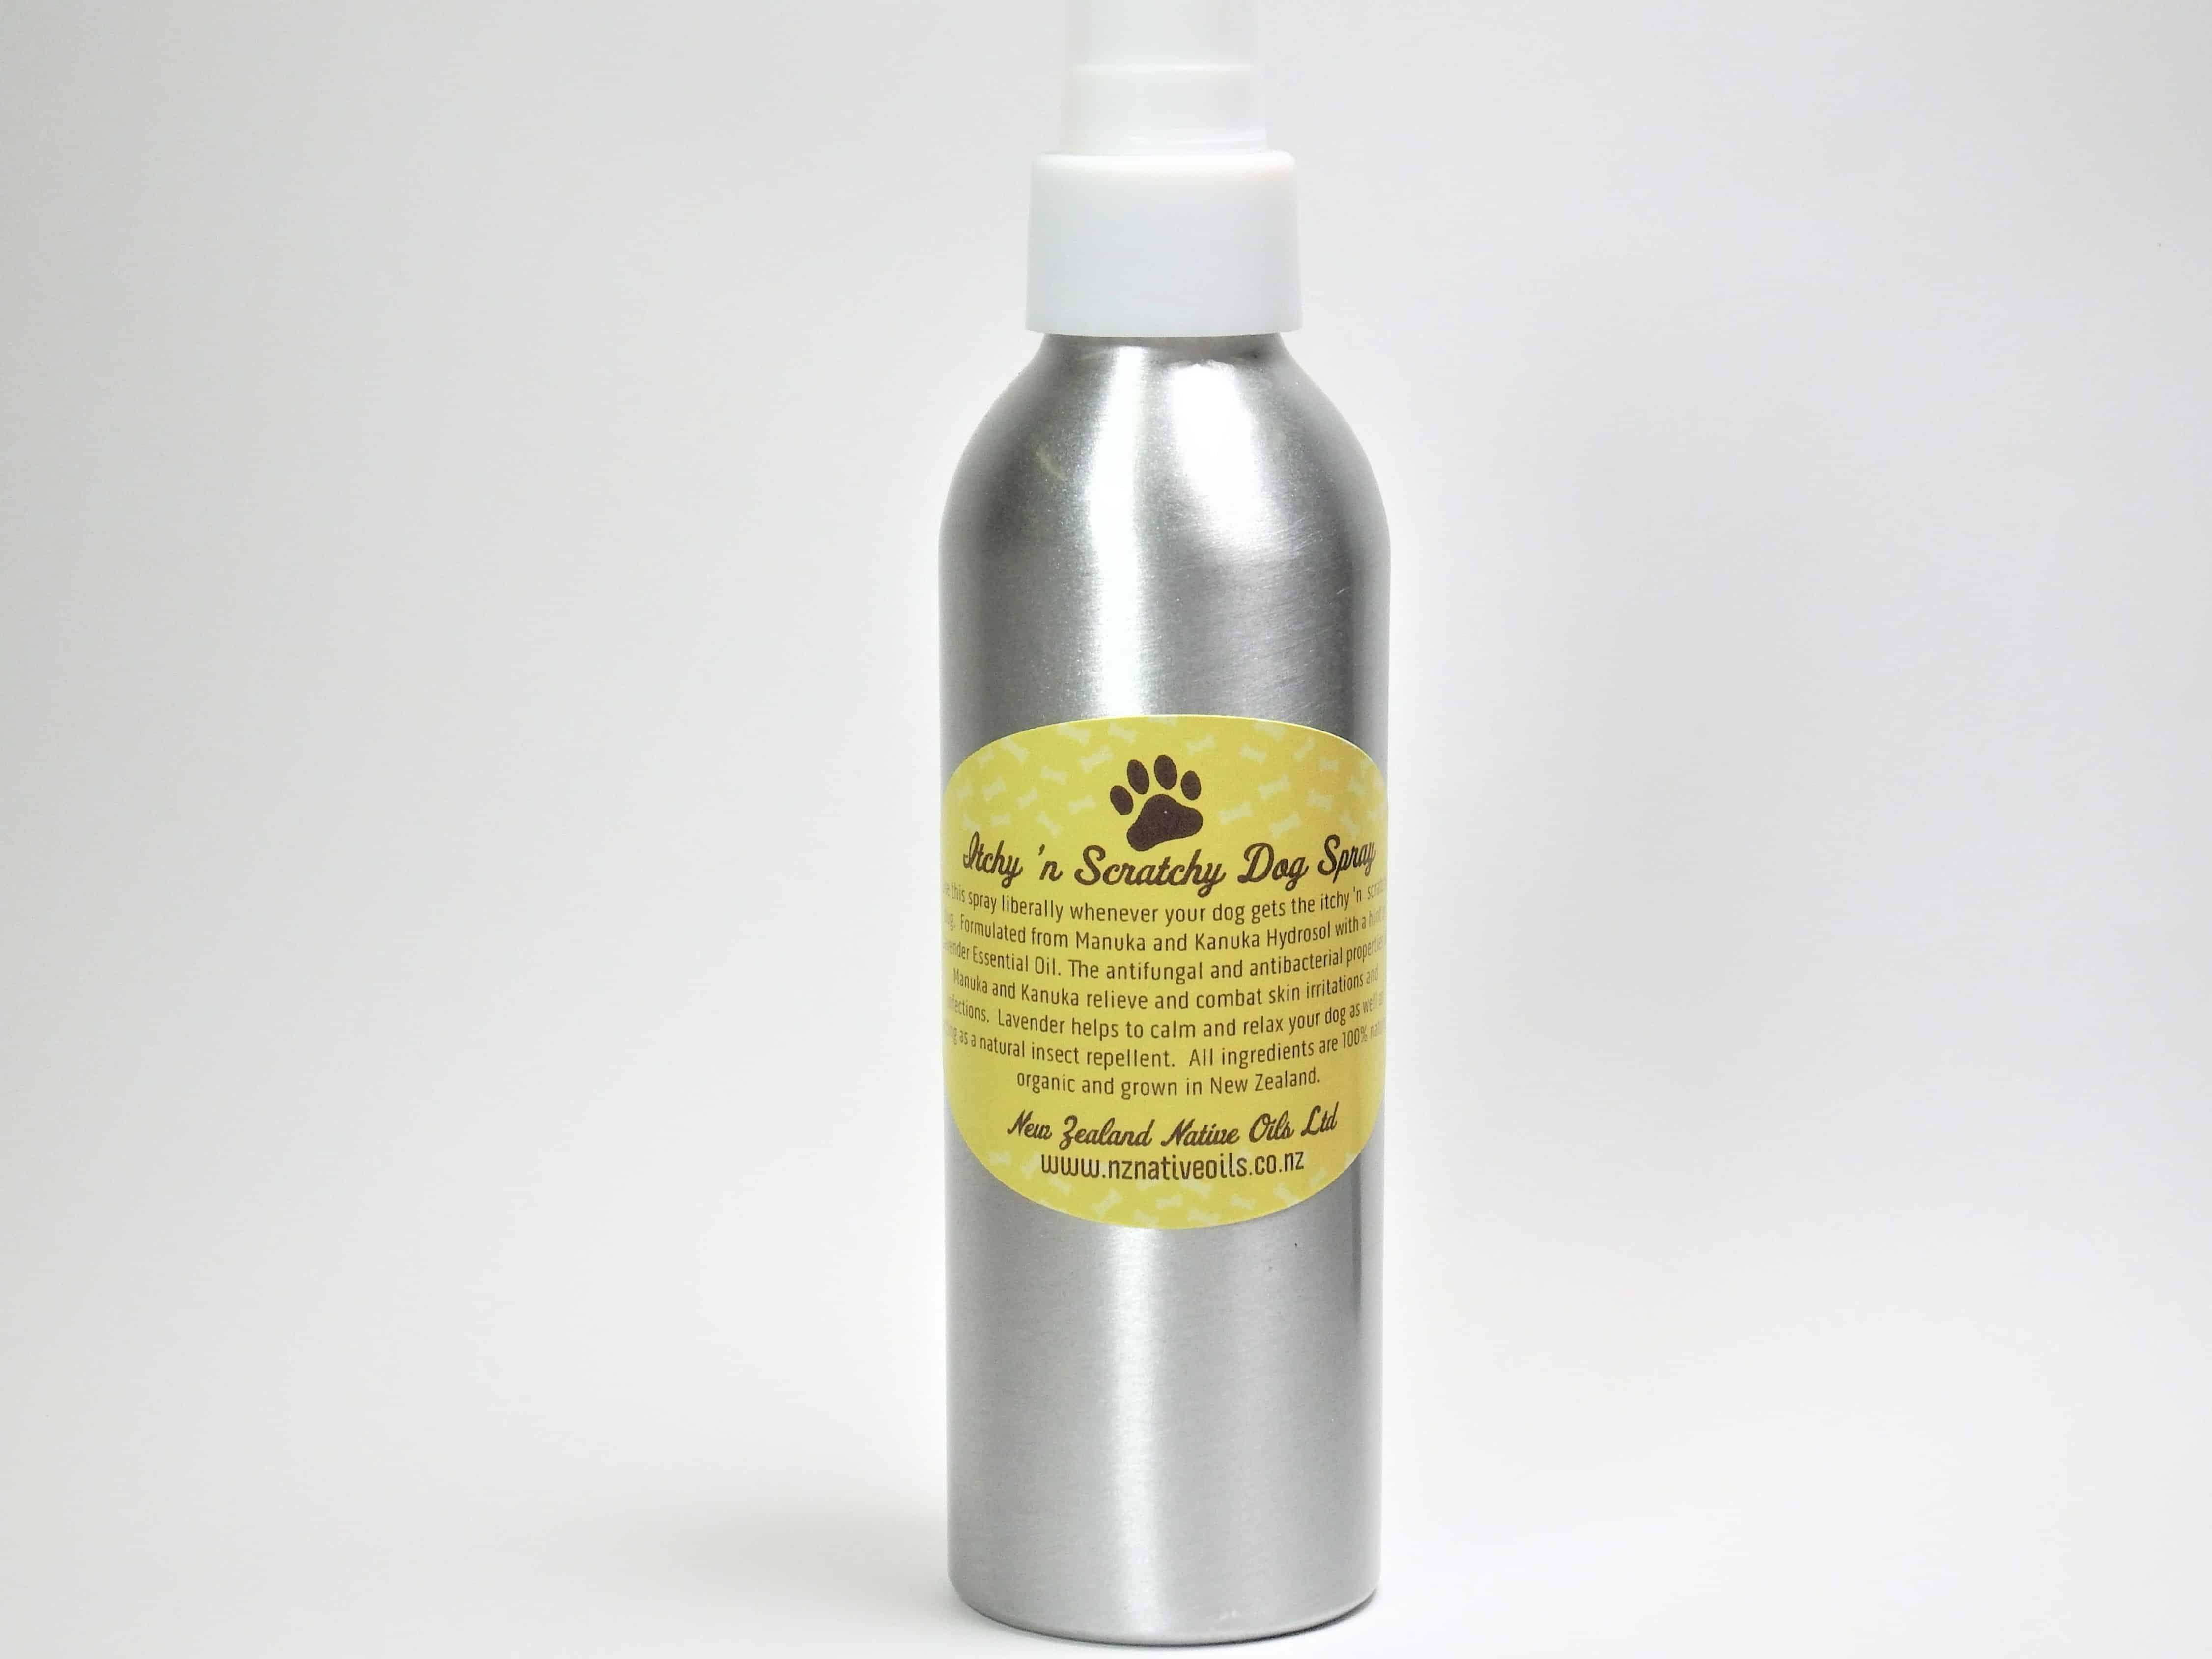 Itchy scratchy dog spray